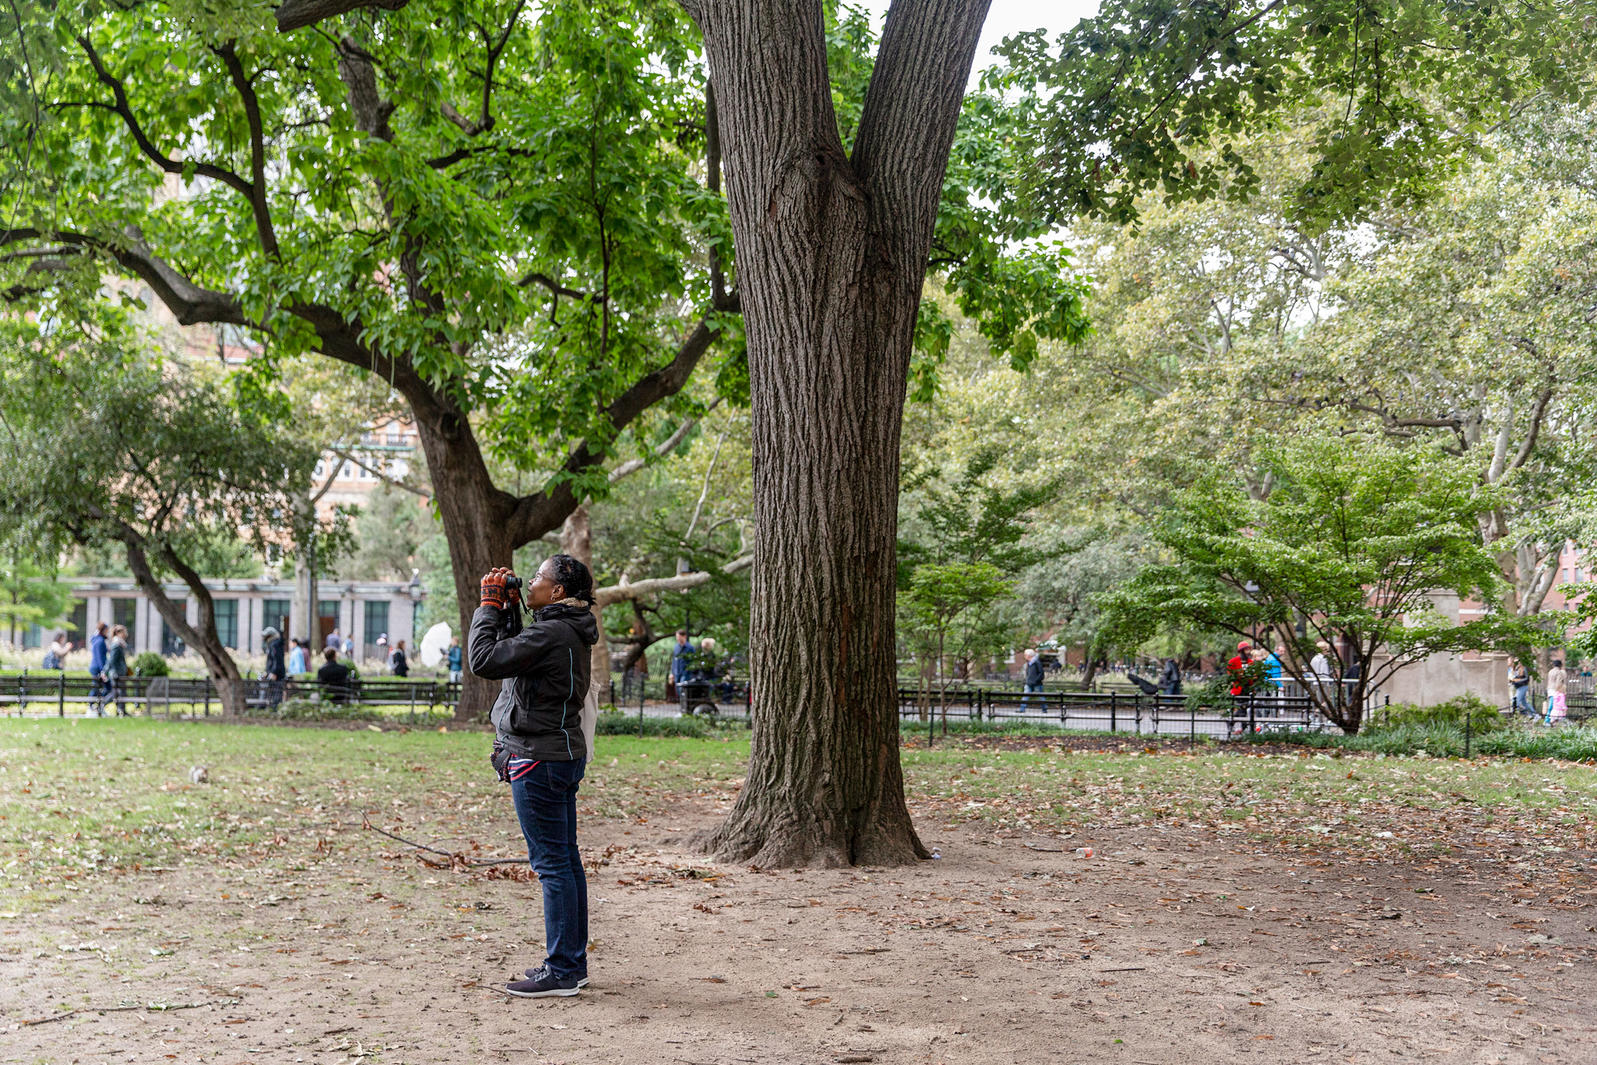 The author birding in her patch in Washington Square Park, New York City. Eva Deitch